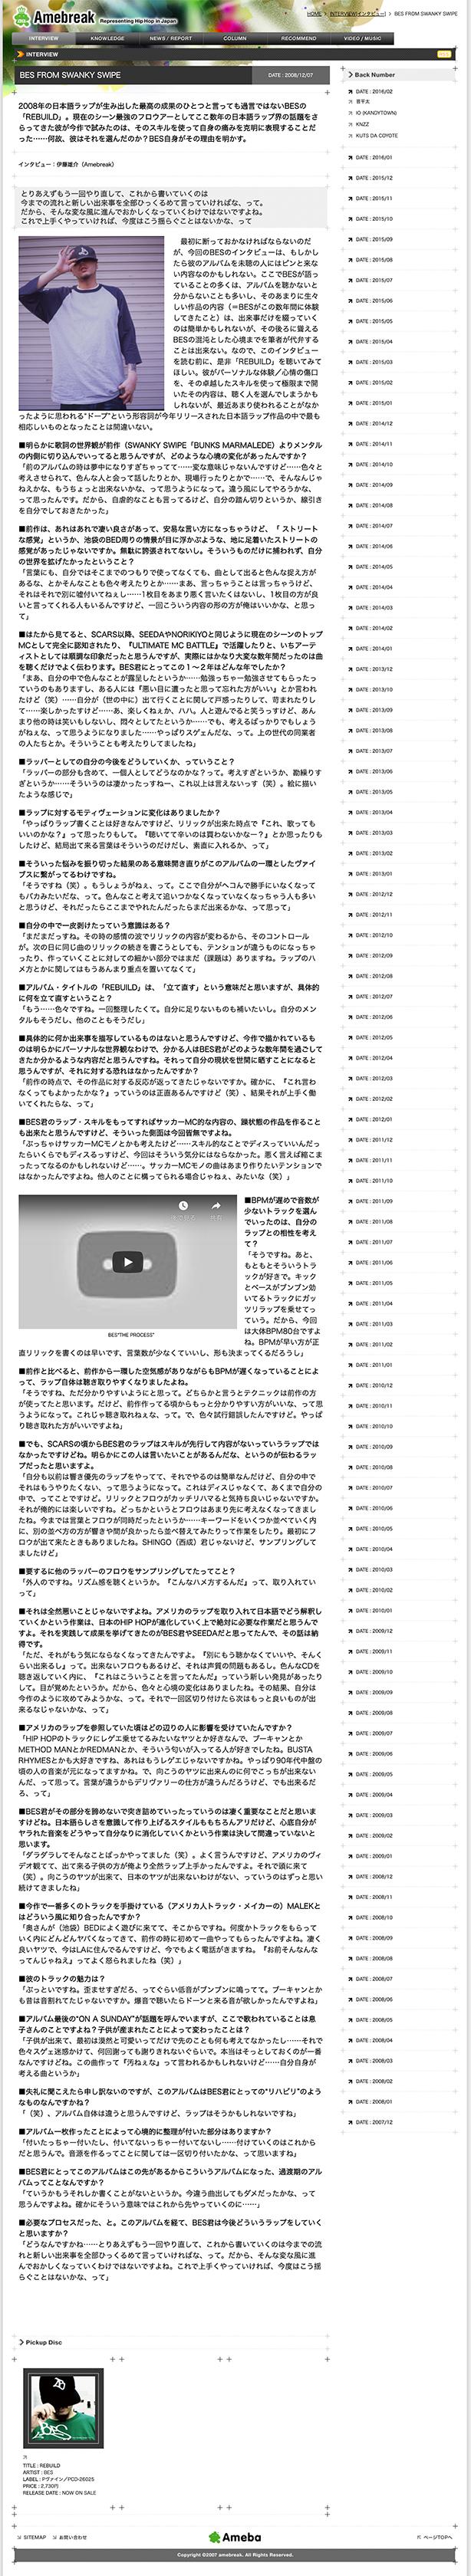 amebreak.ameba.jp_interview_2008_12_000588.html